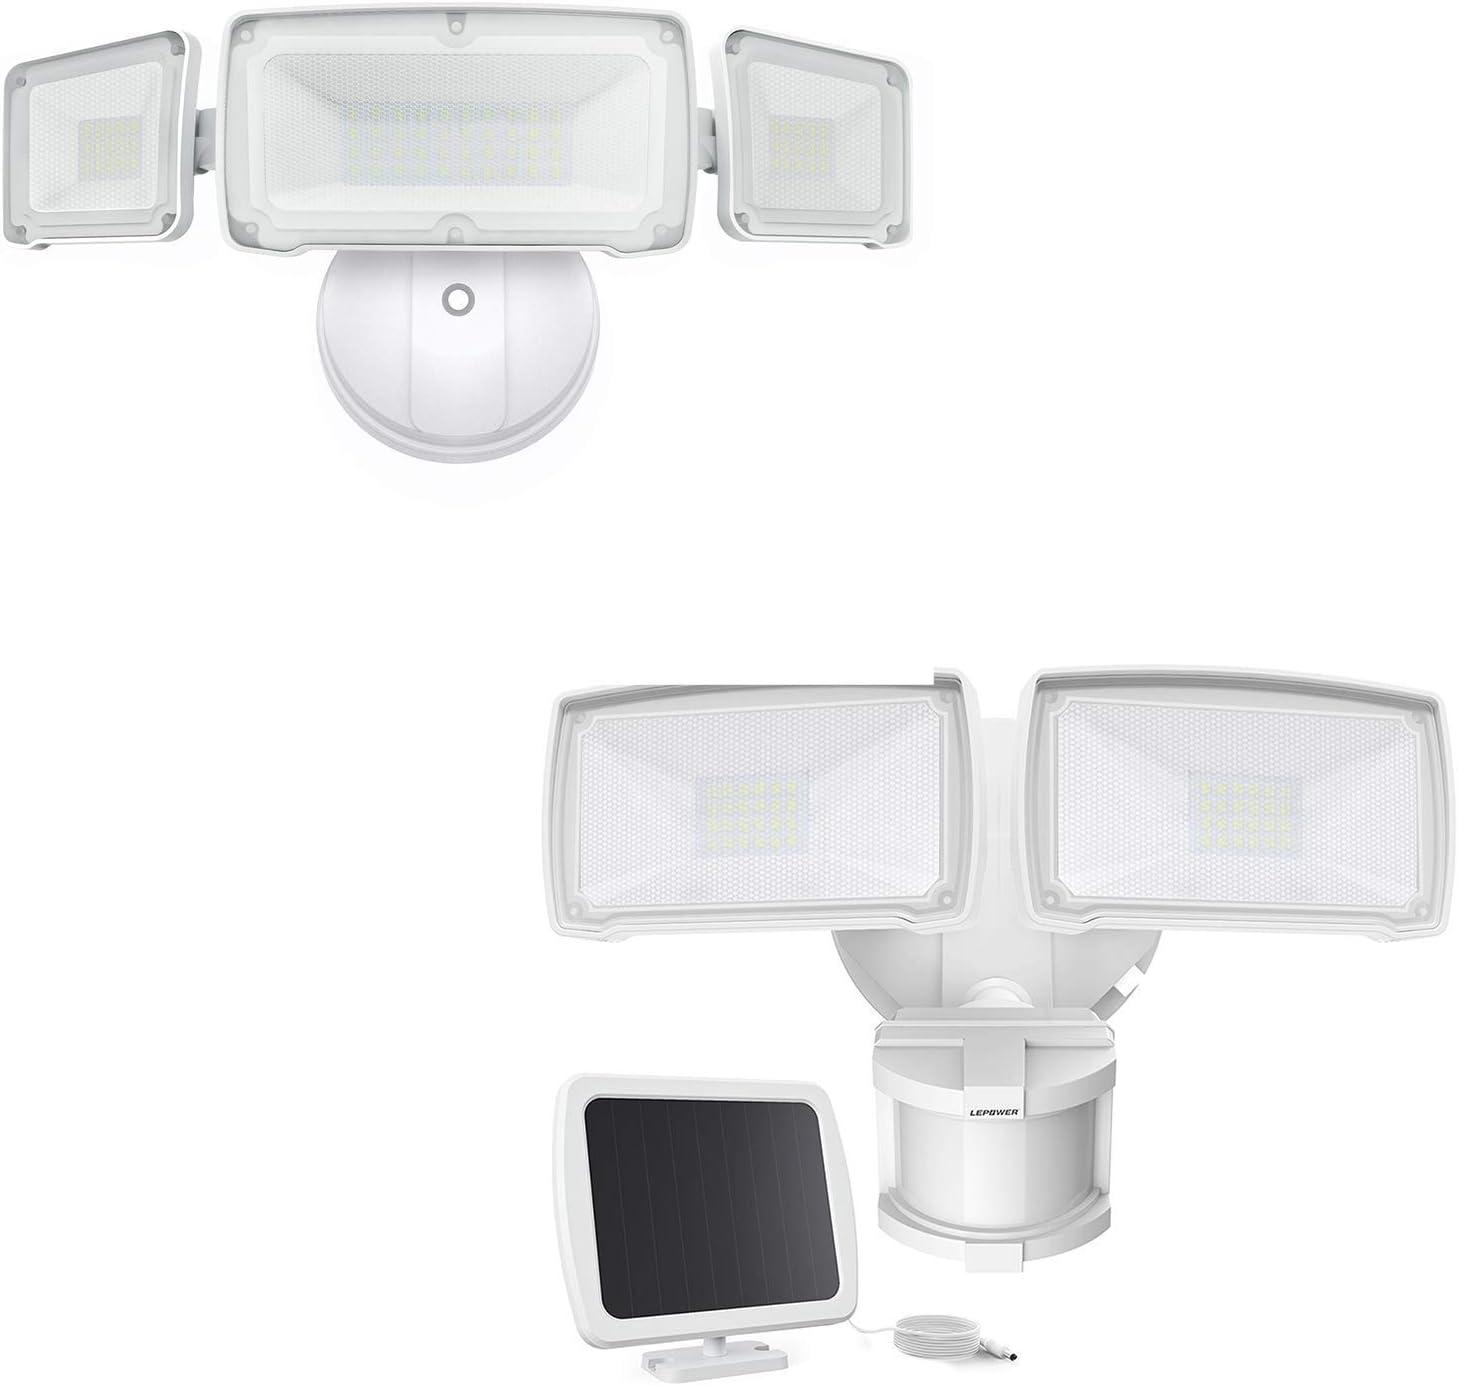 LEPOWER LED Security Lights Outdoor, Adjustable Head Security Light, 5500K White Light, IP65 Waterproof Flood Light for Garage, Yard, Patio(Dusk to Dawn& Solar Power)